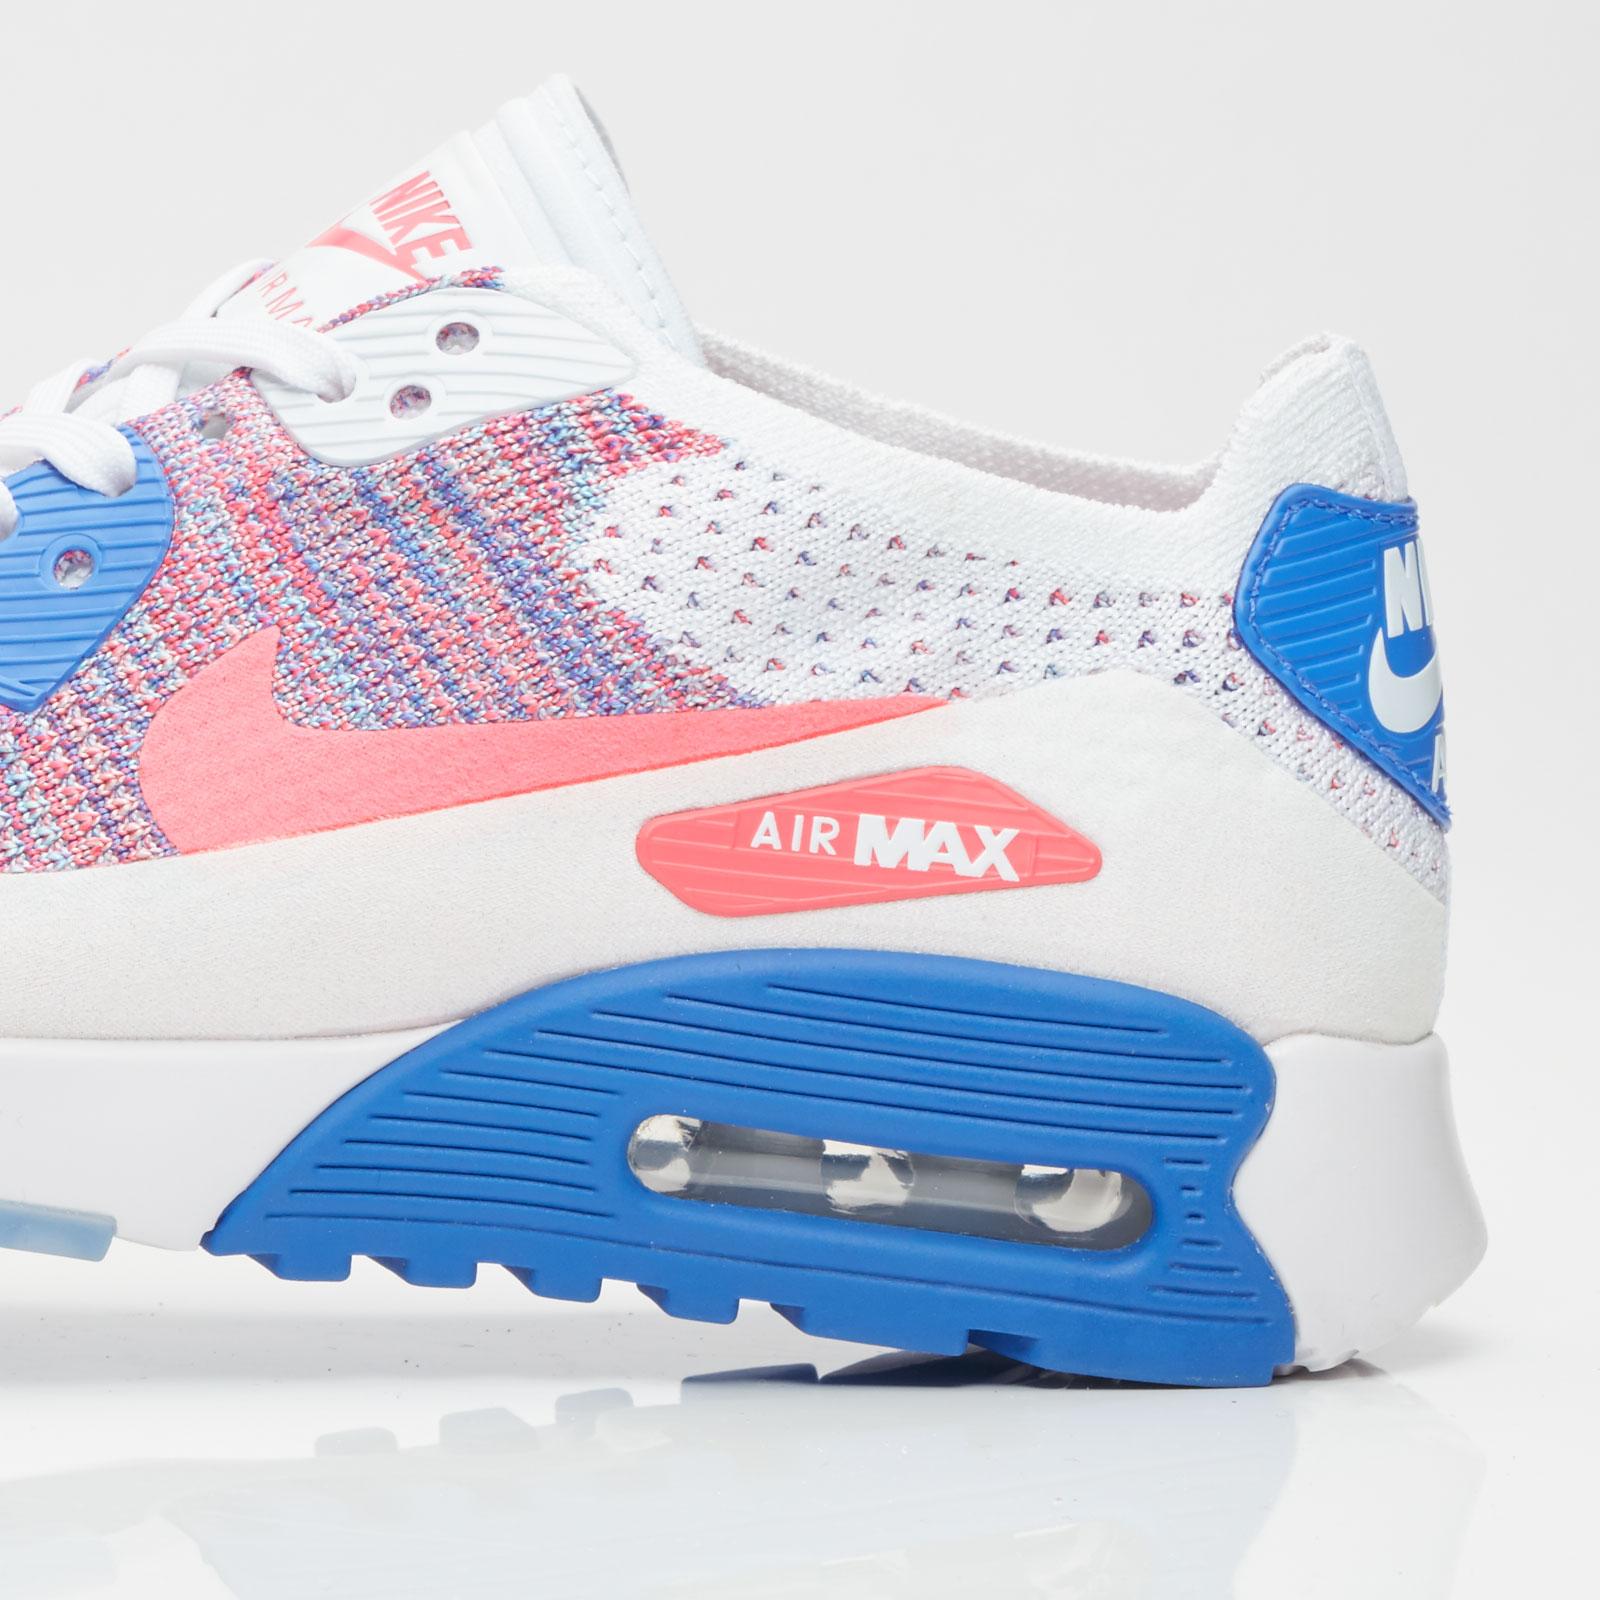 detailed look cc3b4 fa50c ... Nike Sportswear Wmns Air Max 90 Ultra 2.0 Flyknit